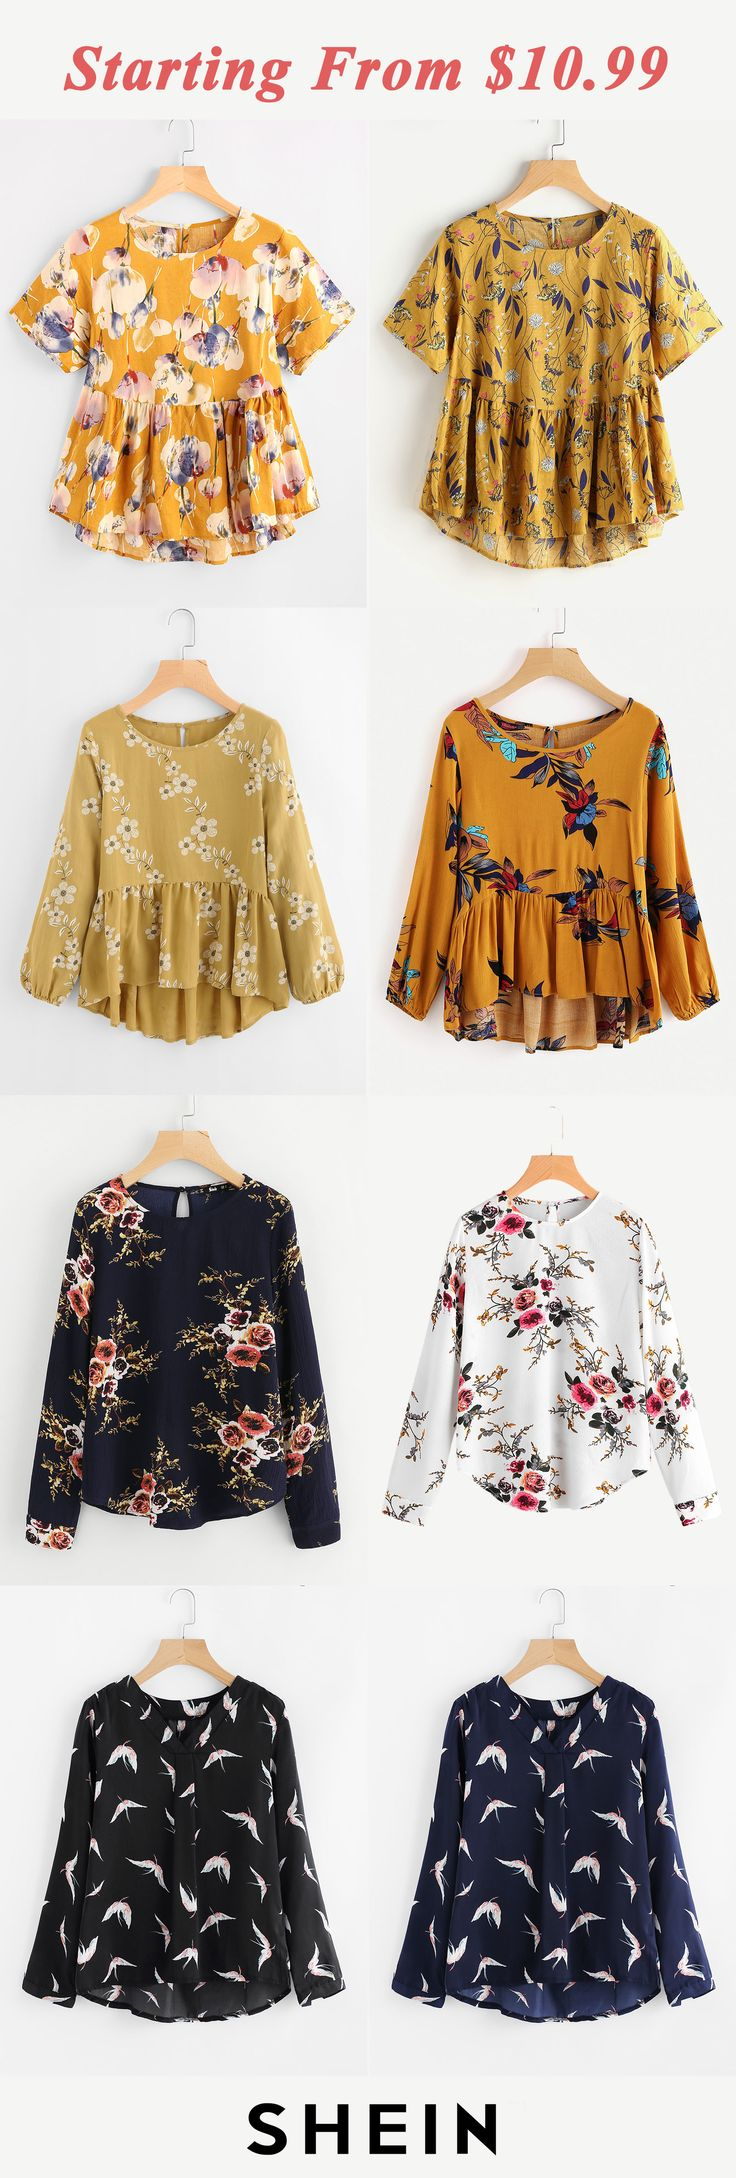 Print blouses start at $10.99